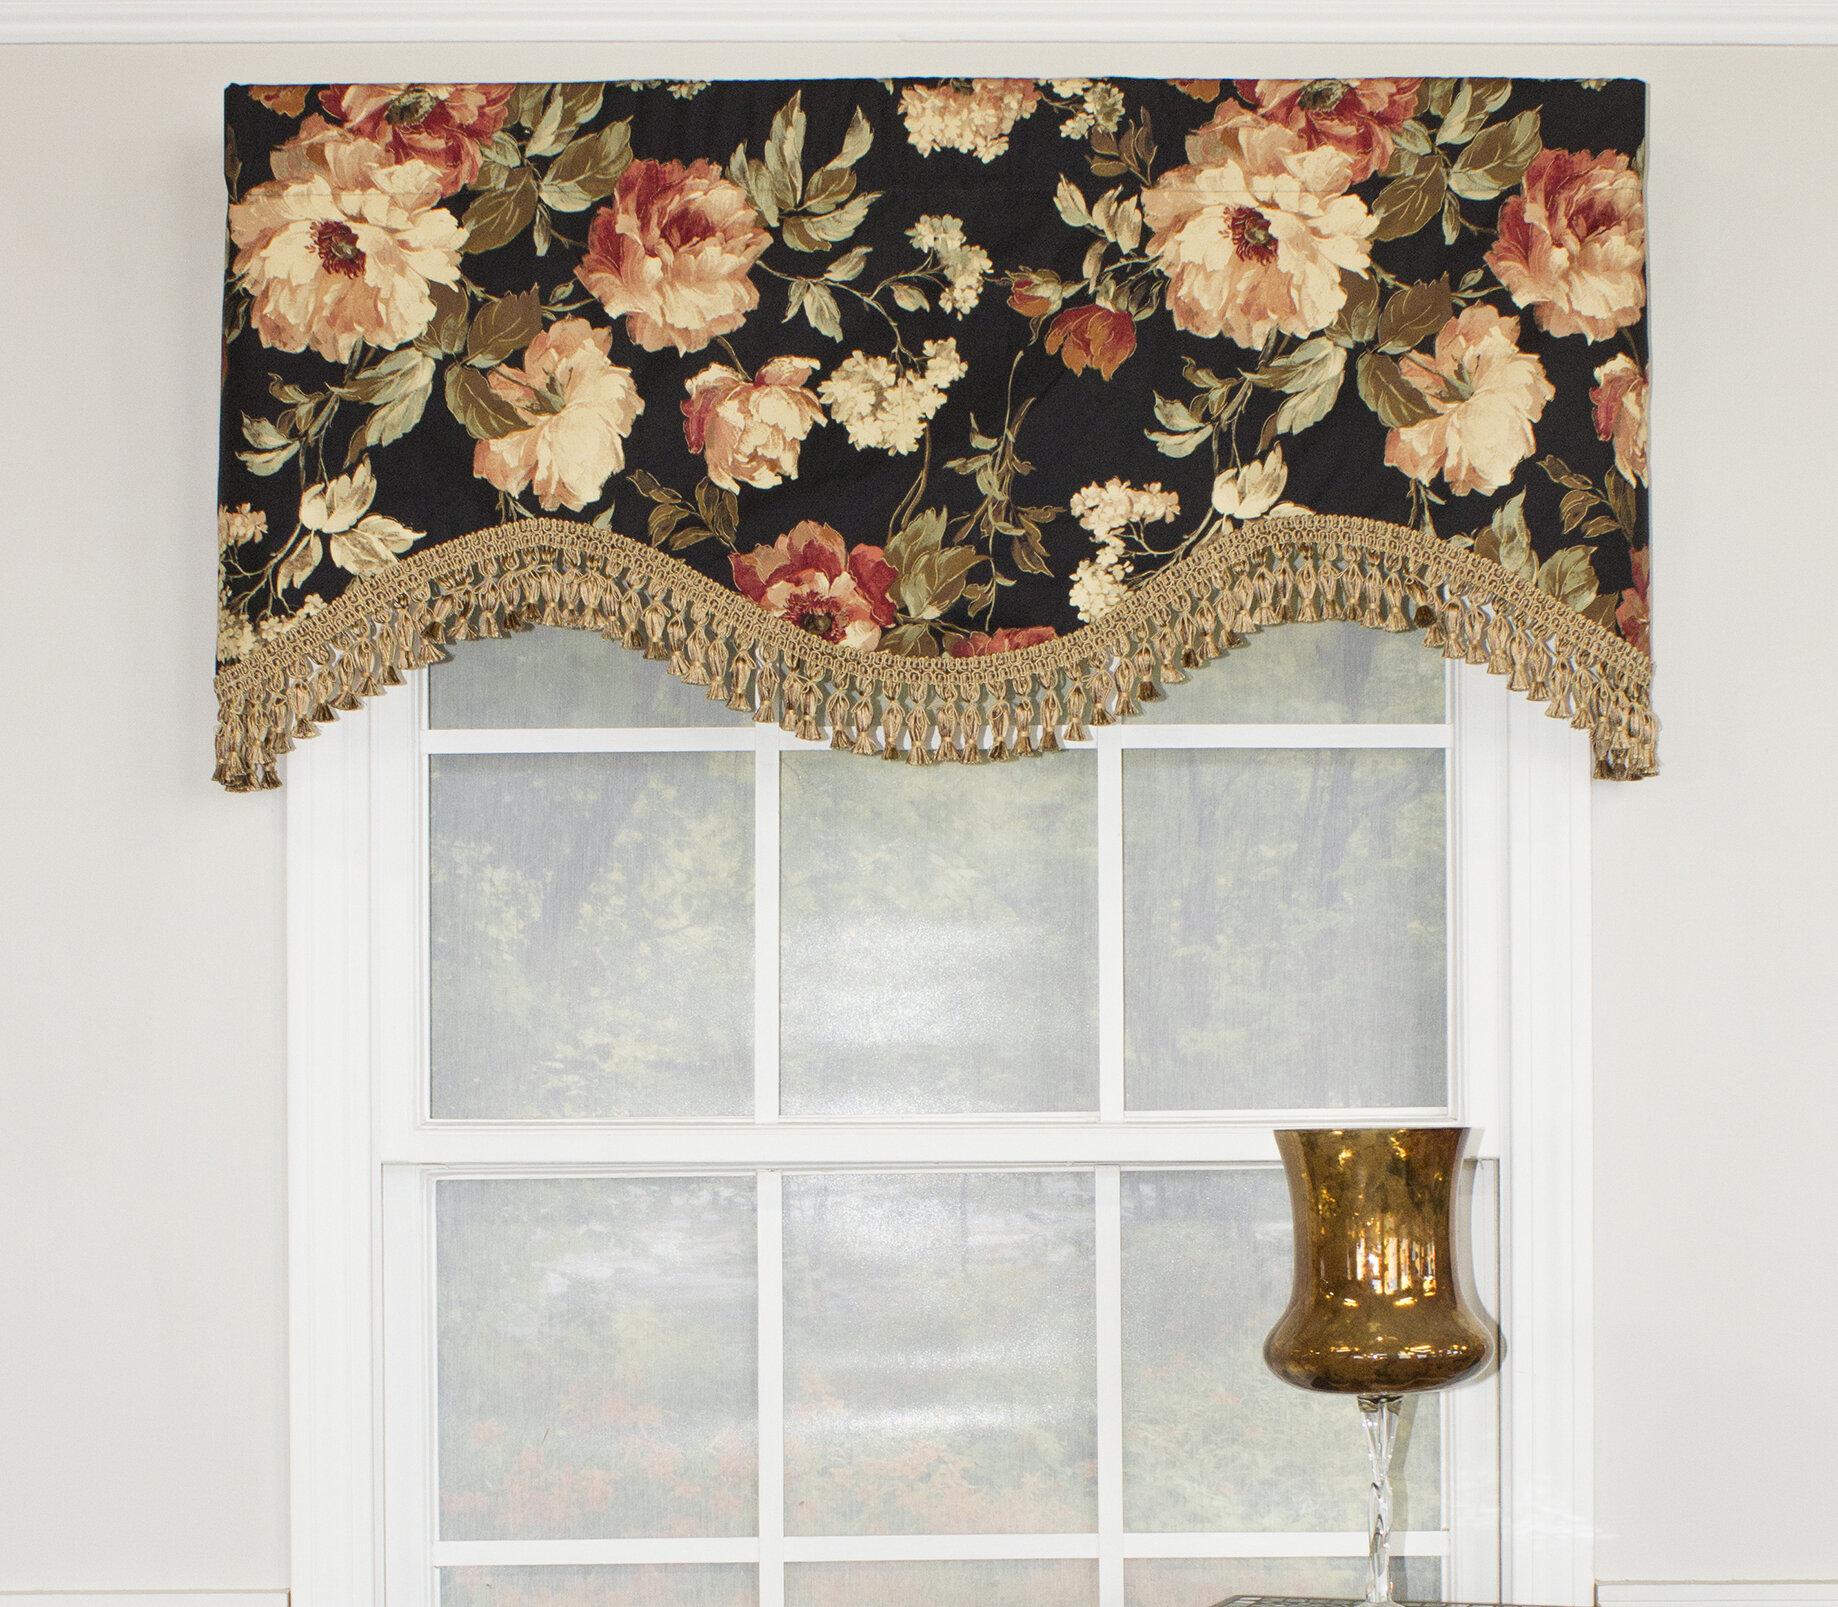 cornice window valance no sew darby home co bardon cornice 51